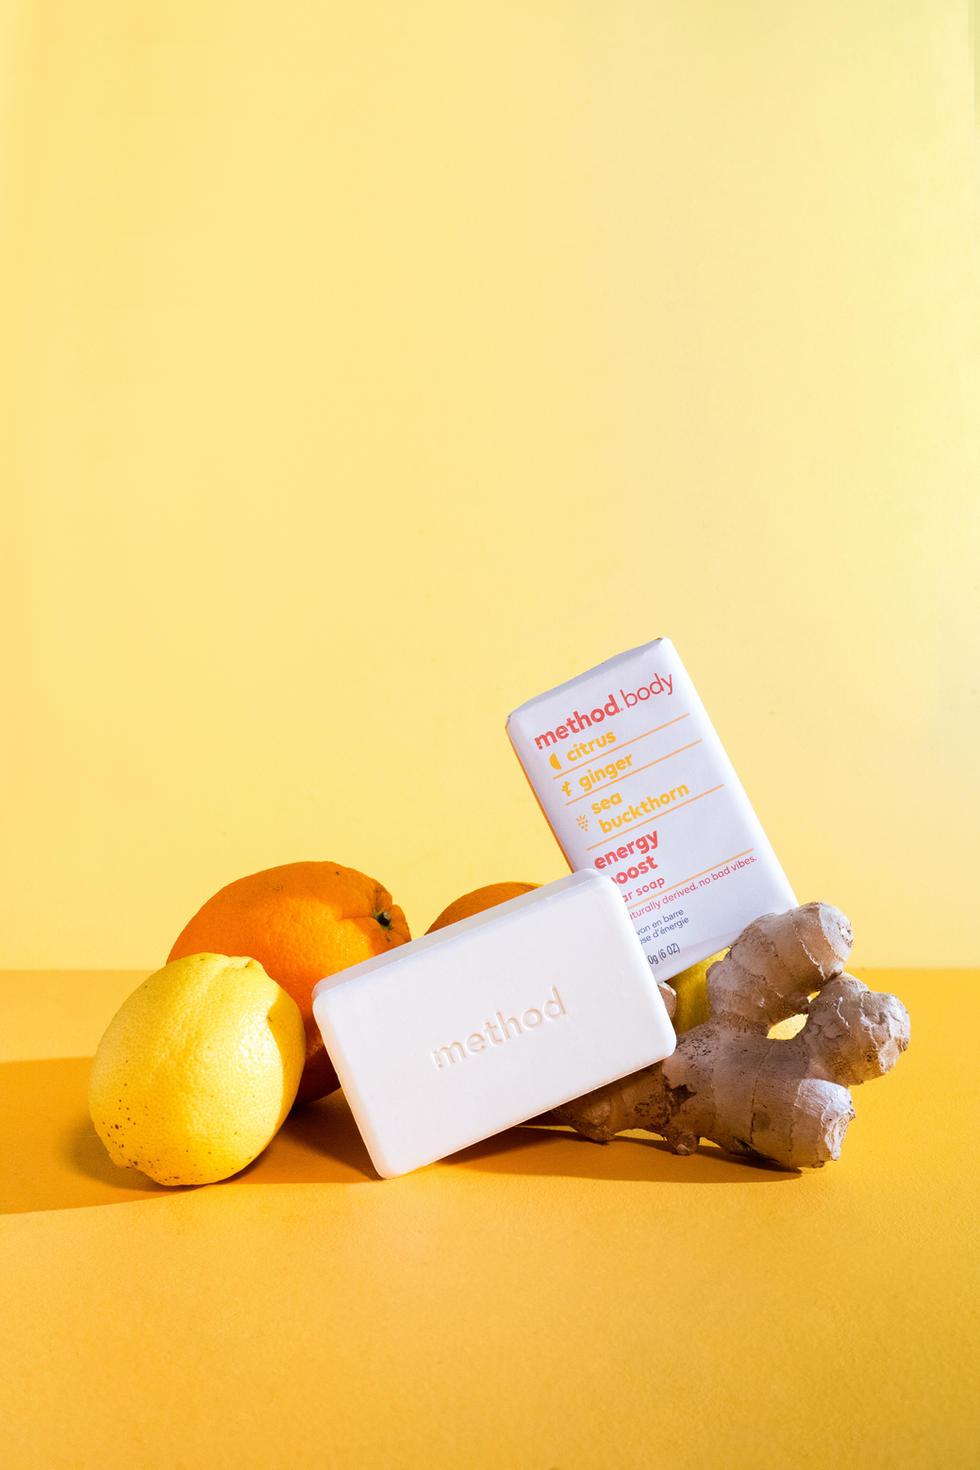 Soap Bar with Citrus + Ginger | Method Body | Product Photography + Styling | Chromatone Studios